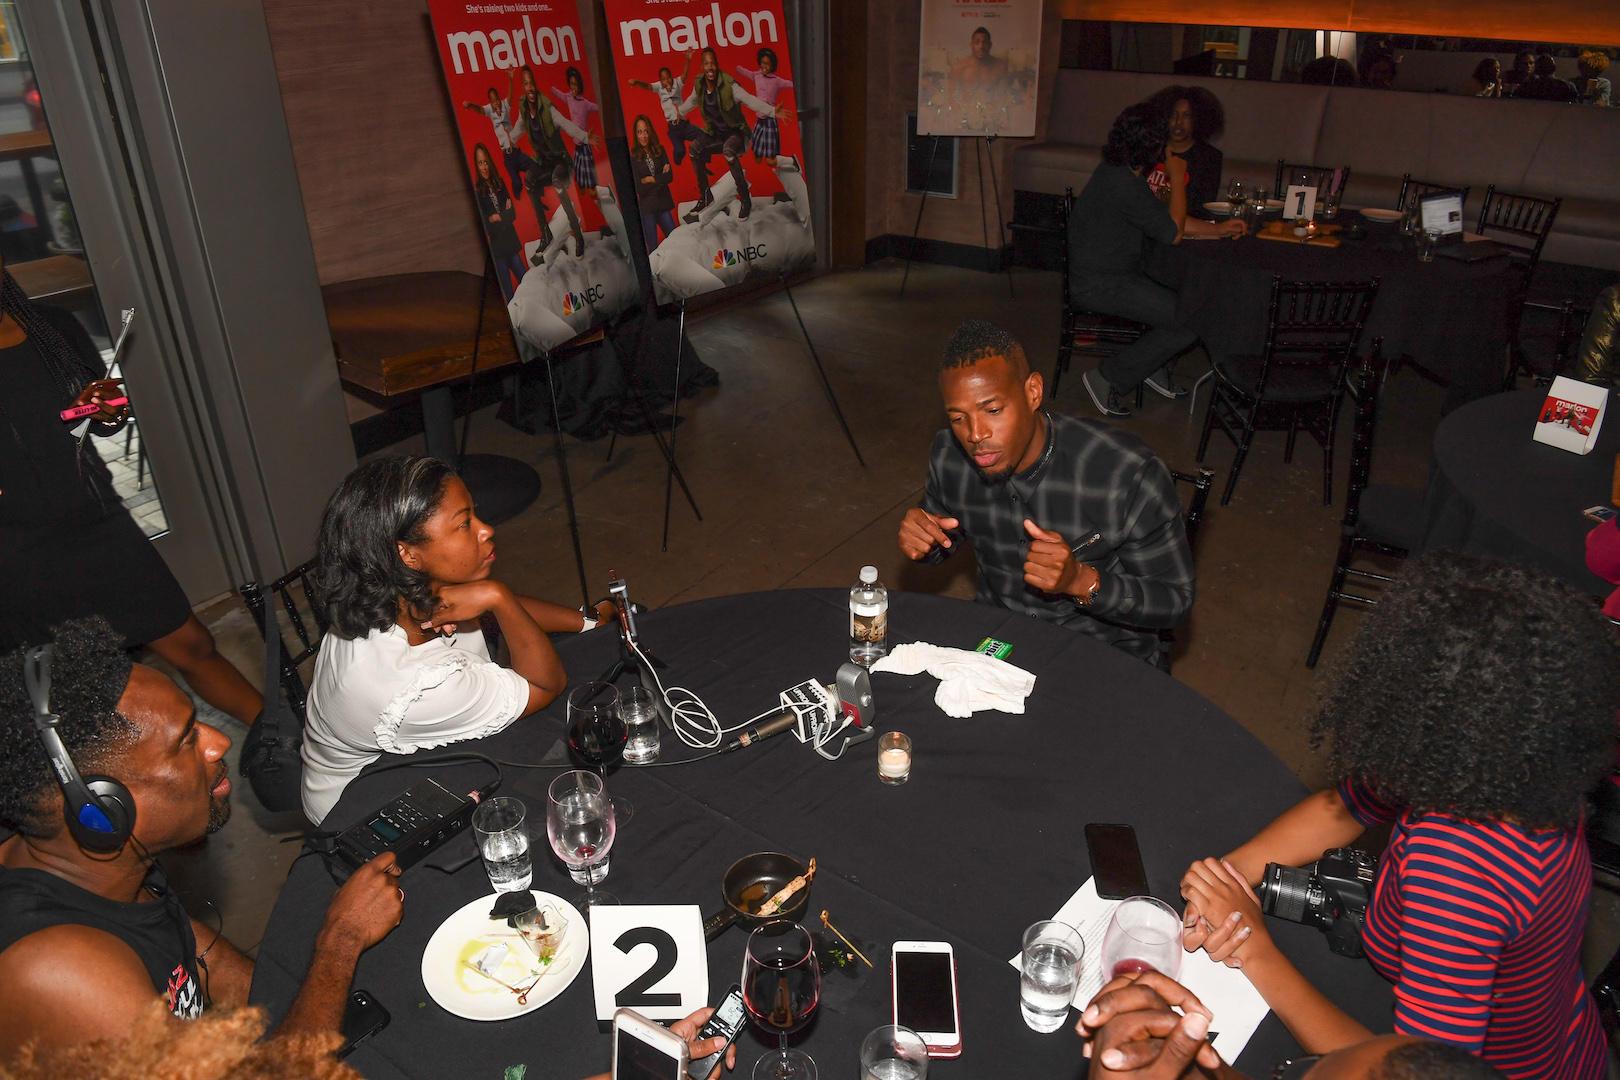 wayan mature singles Watch the wayans bros: dating service from season 5 at tvguidecom.